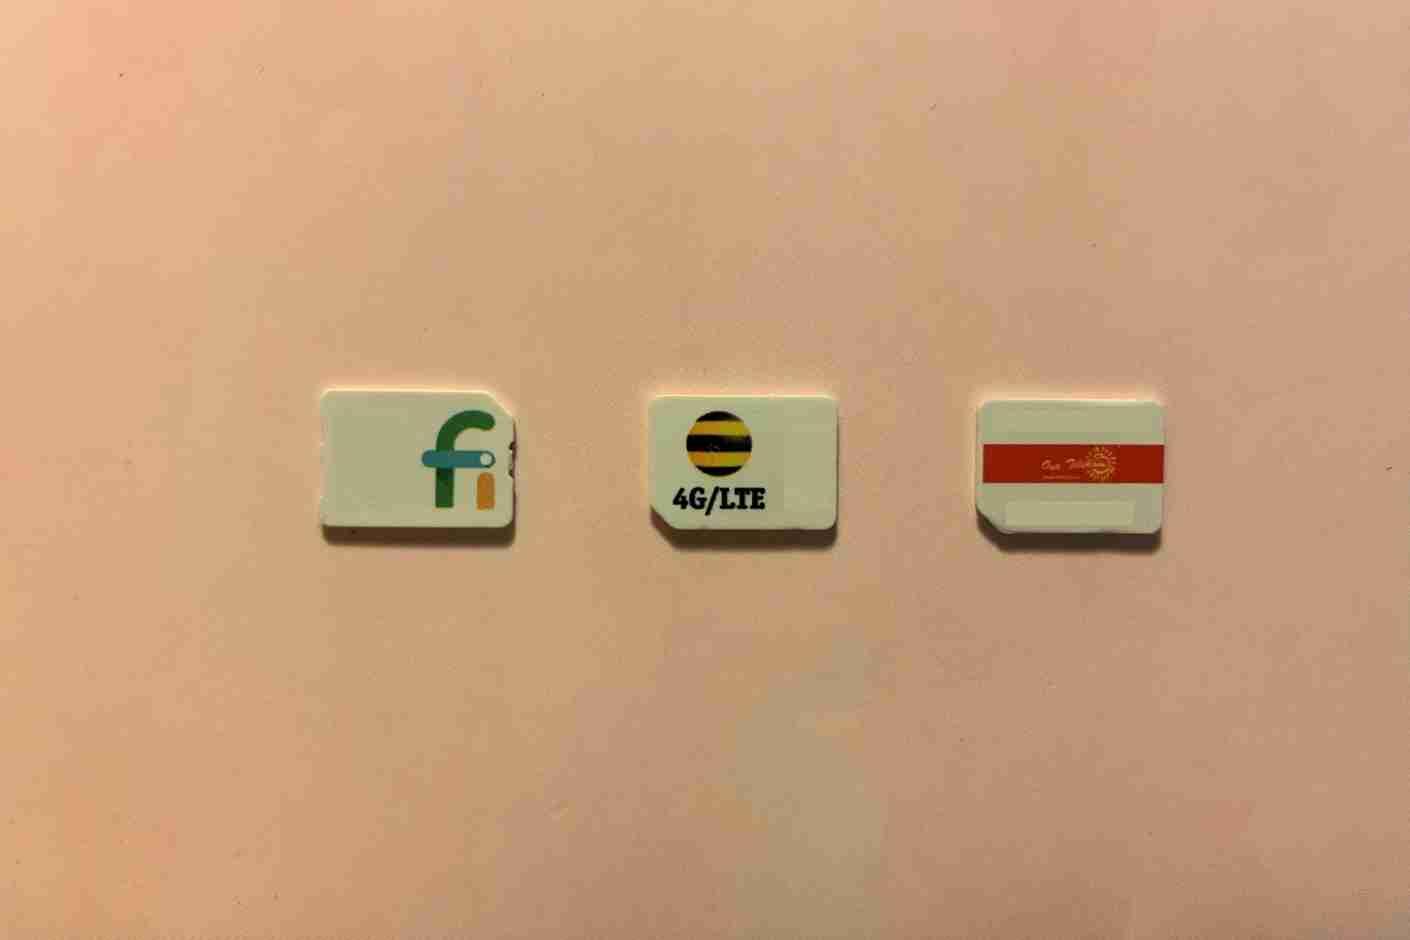 My Google Fi SIM card next to SIM cards from Kazakhstan and Solomon Islands. I